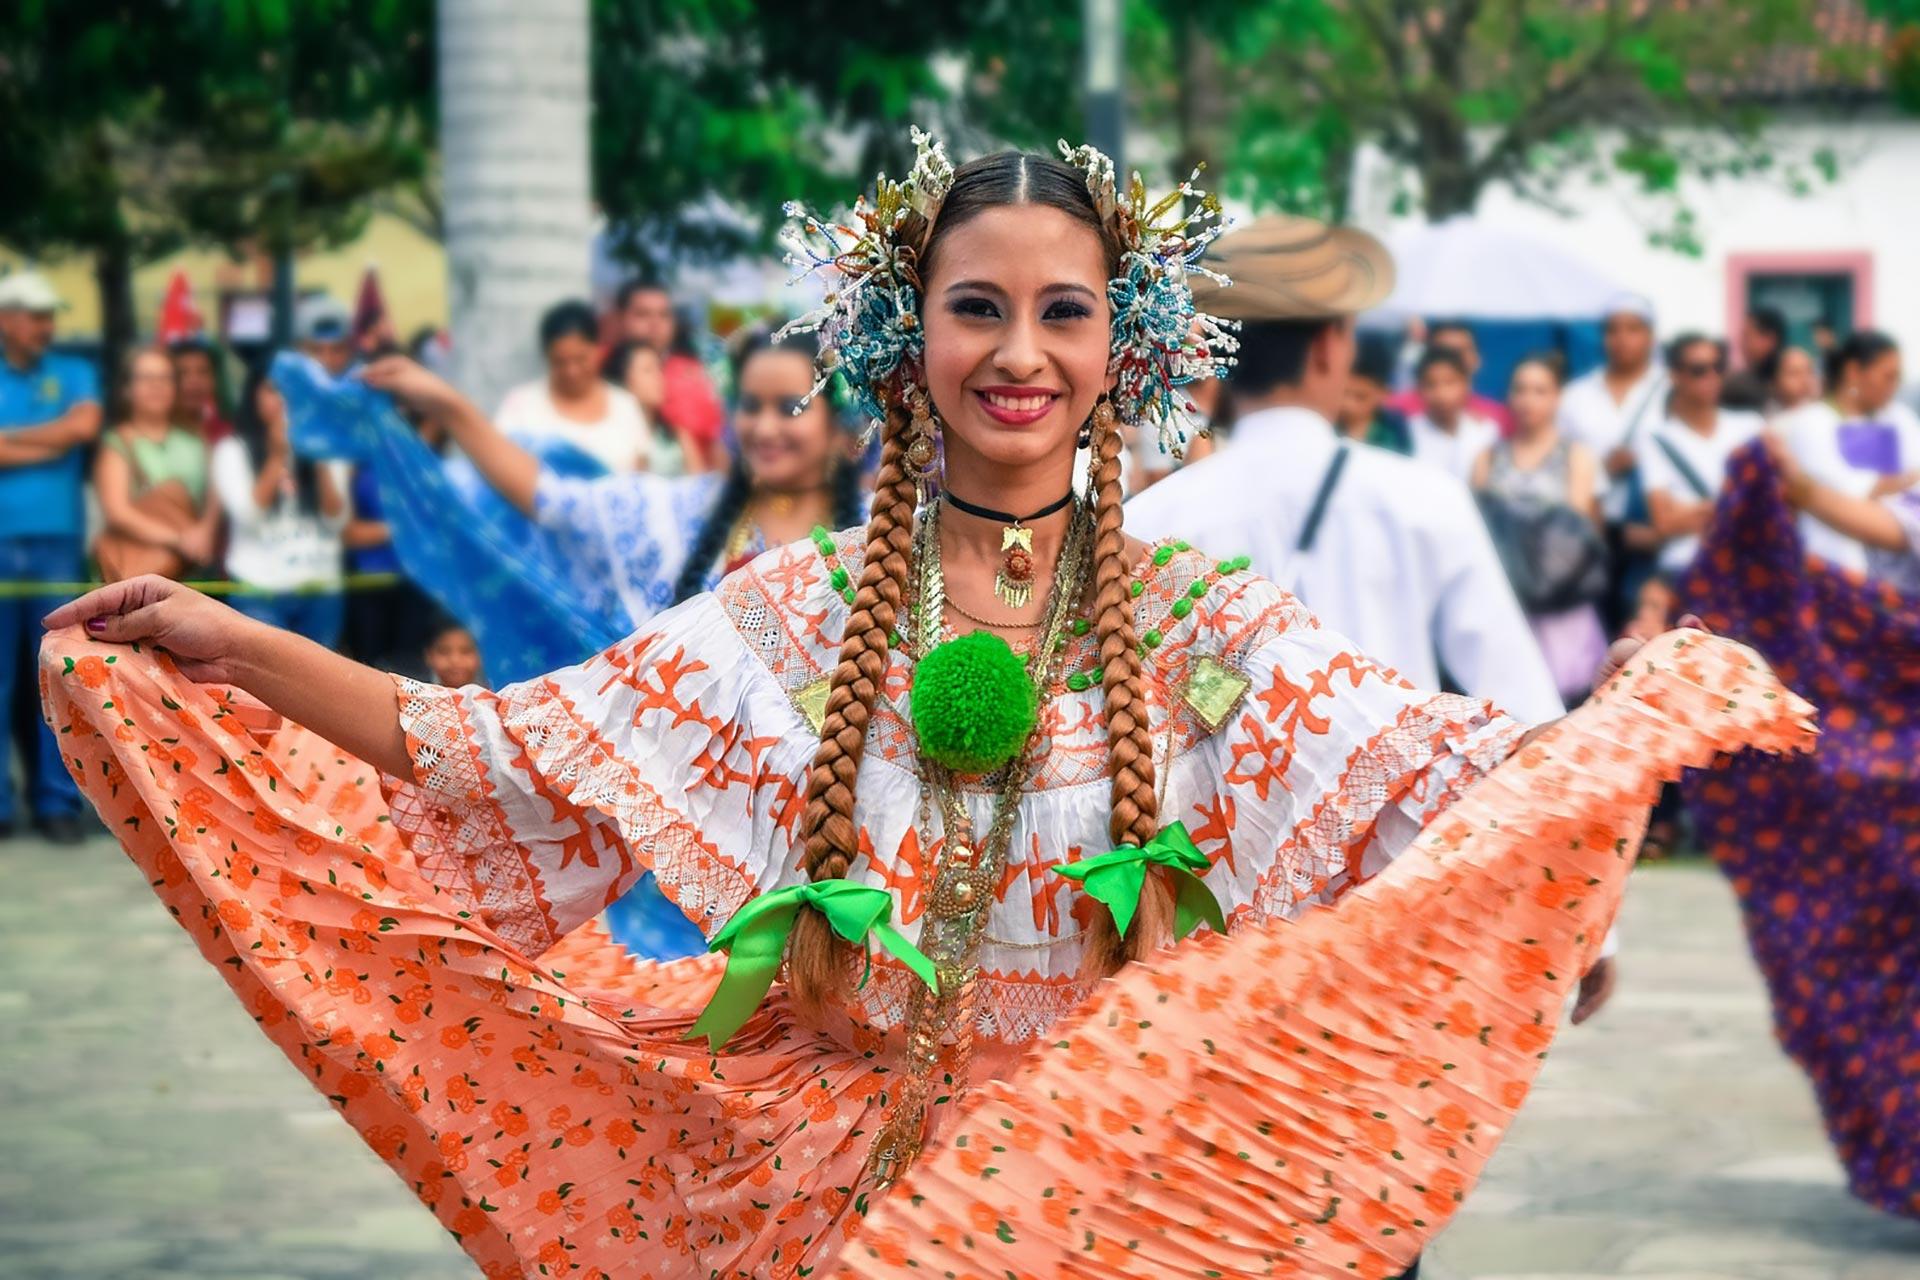 Feiern in Costa Rica